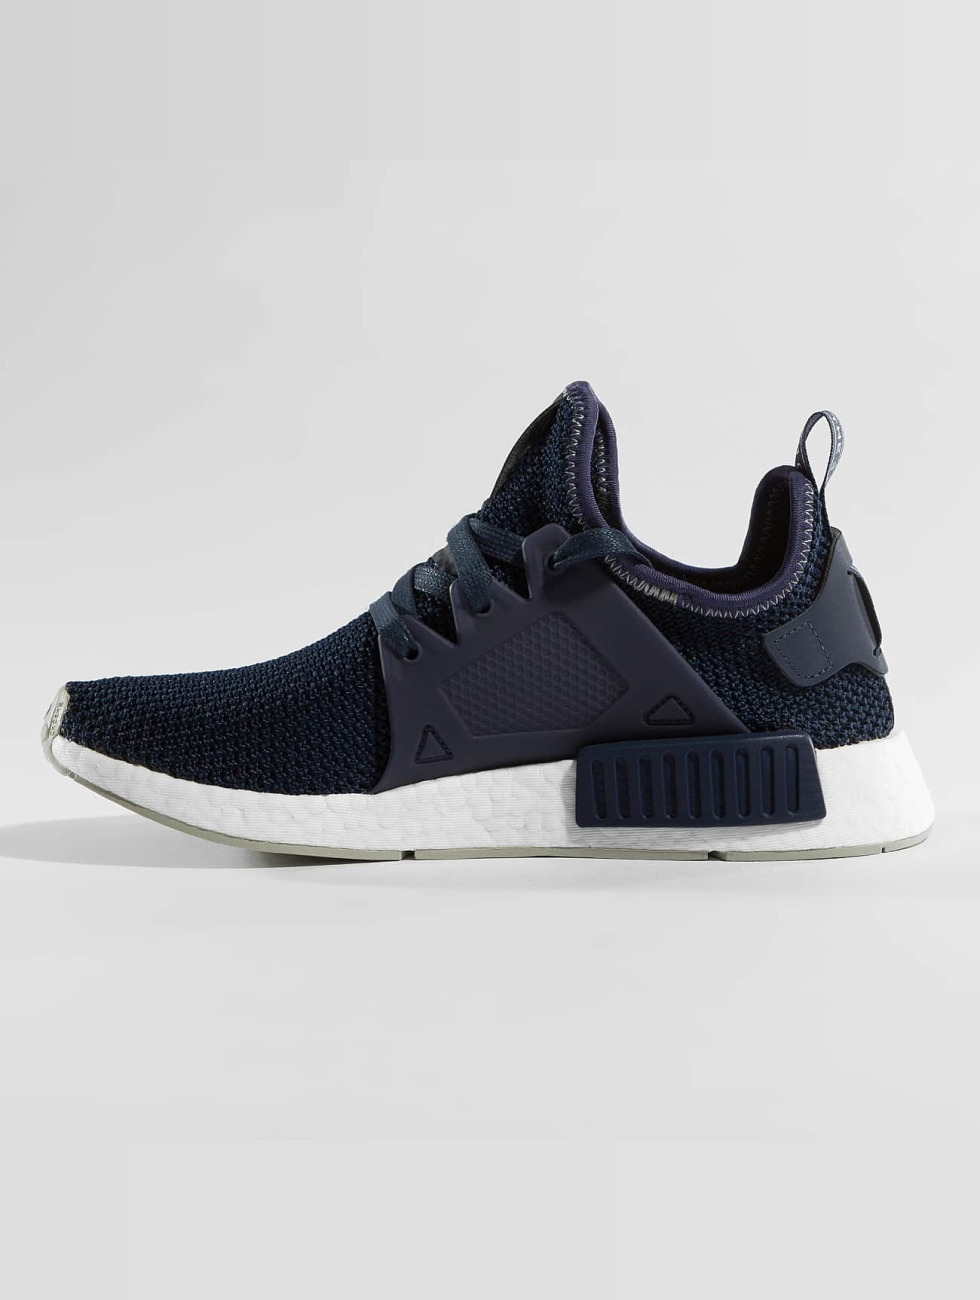 Adidas Originals Scarpa / Sneaker Nmd_xr1 In Blu 368 163 qKZA8FcoUK